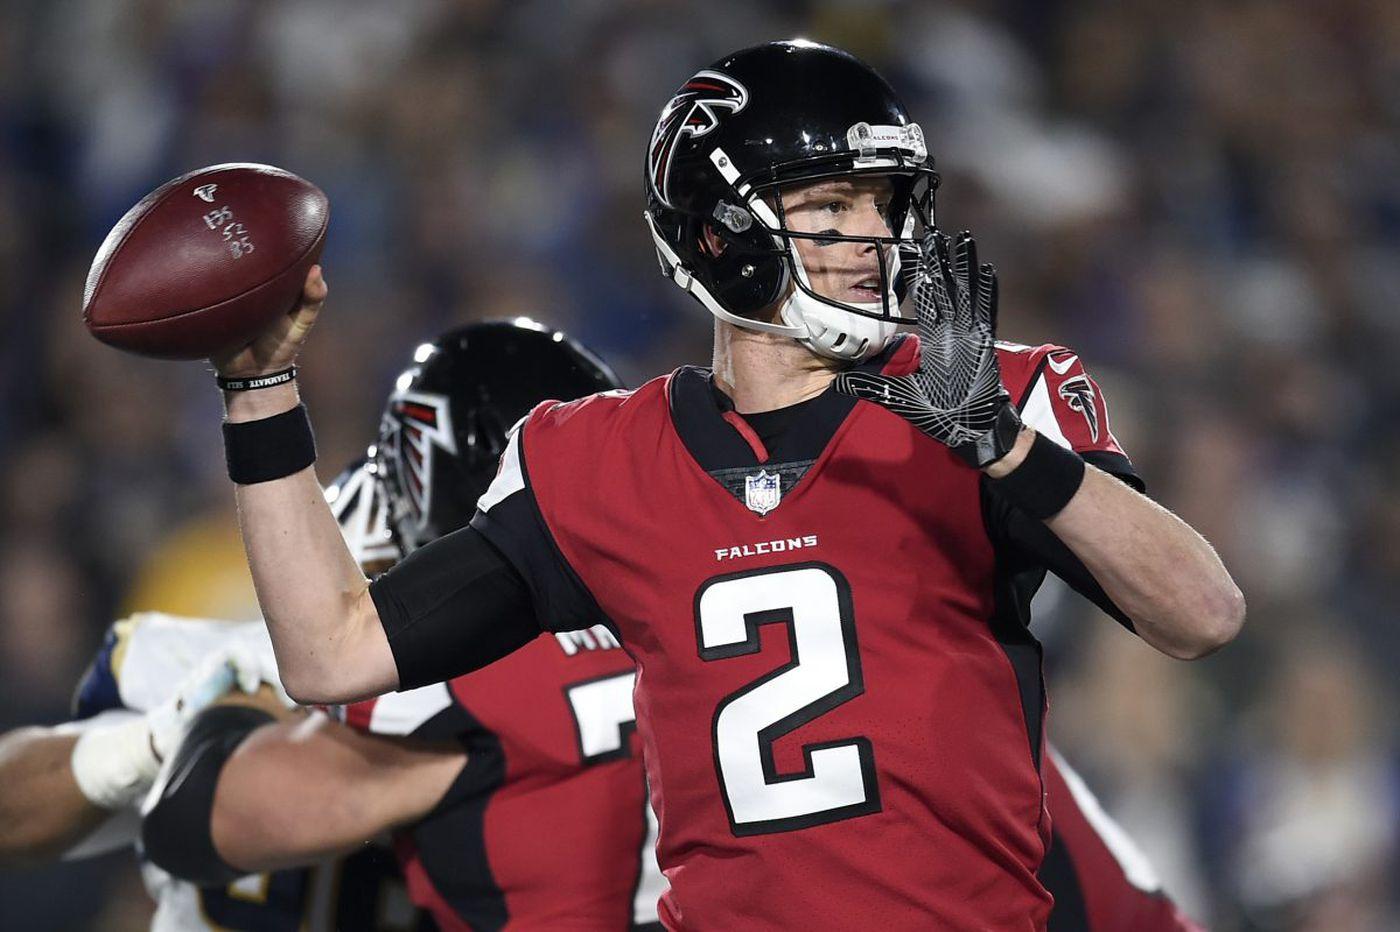 Falcons beat Rams, will play Eagles next Saturday